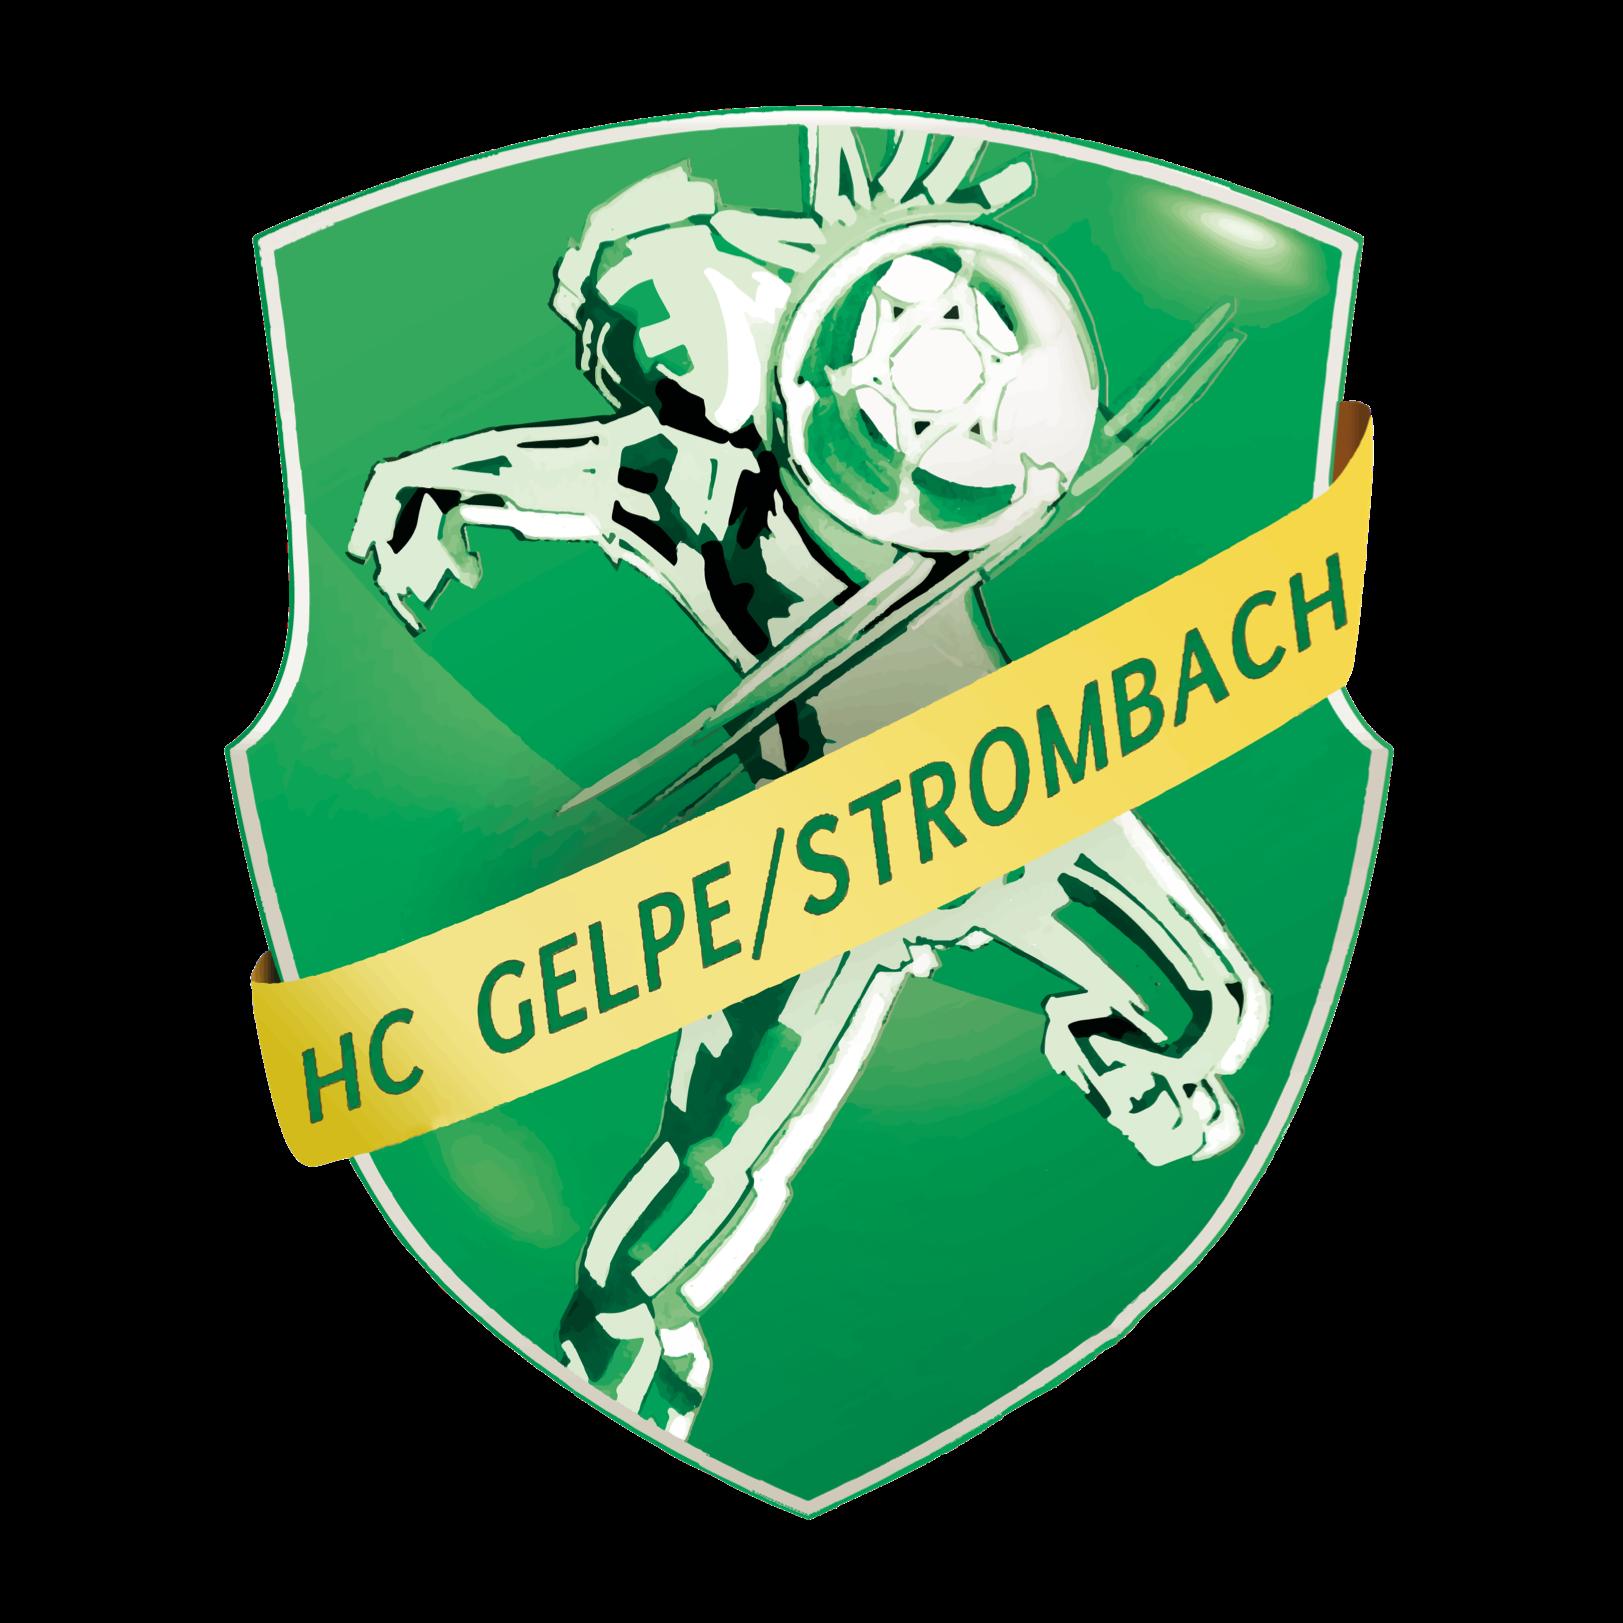 HCGS Shop